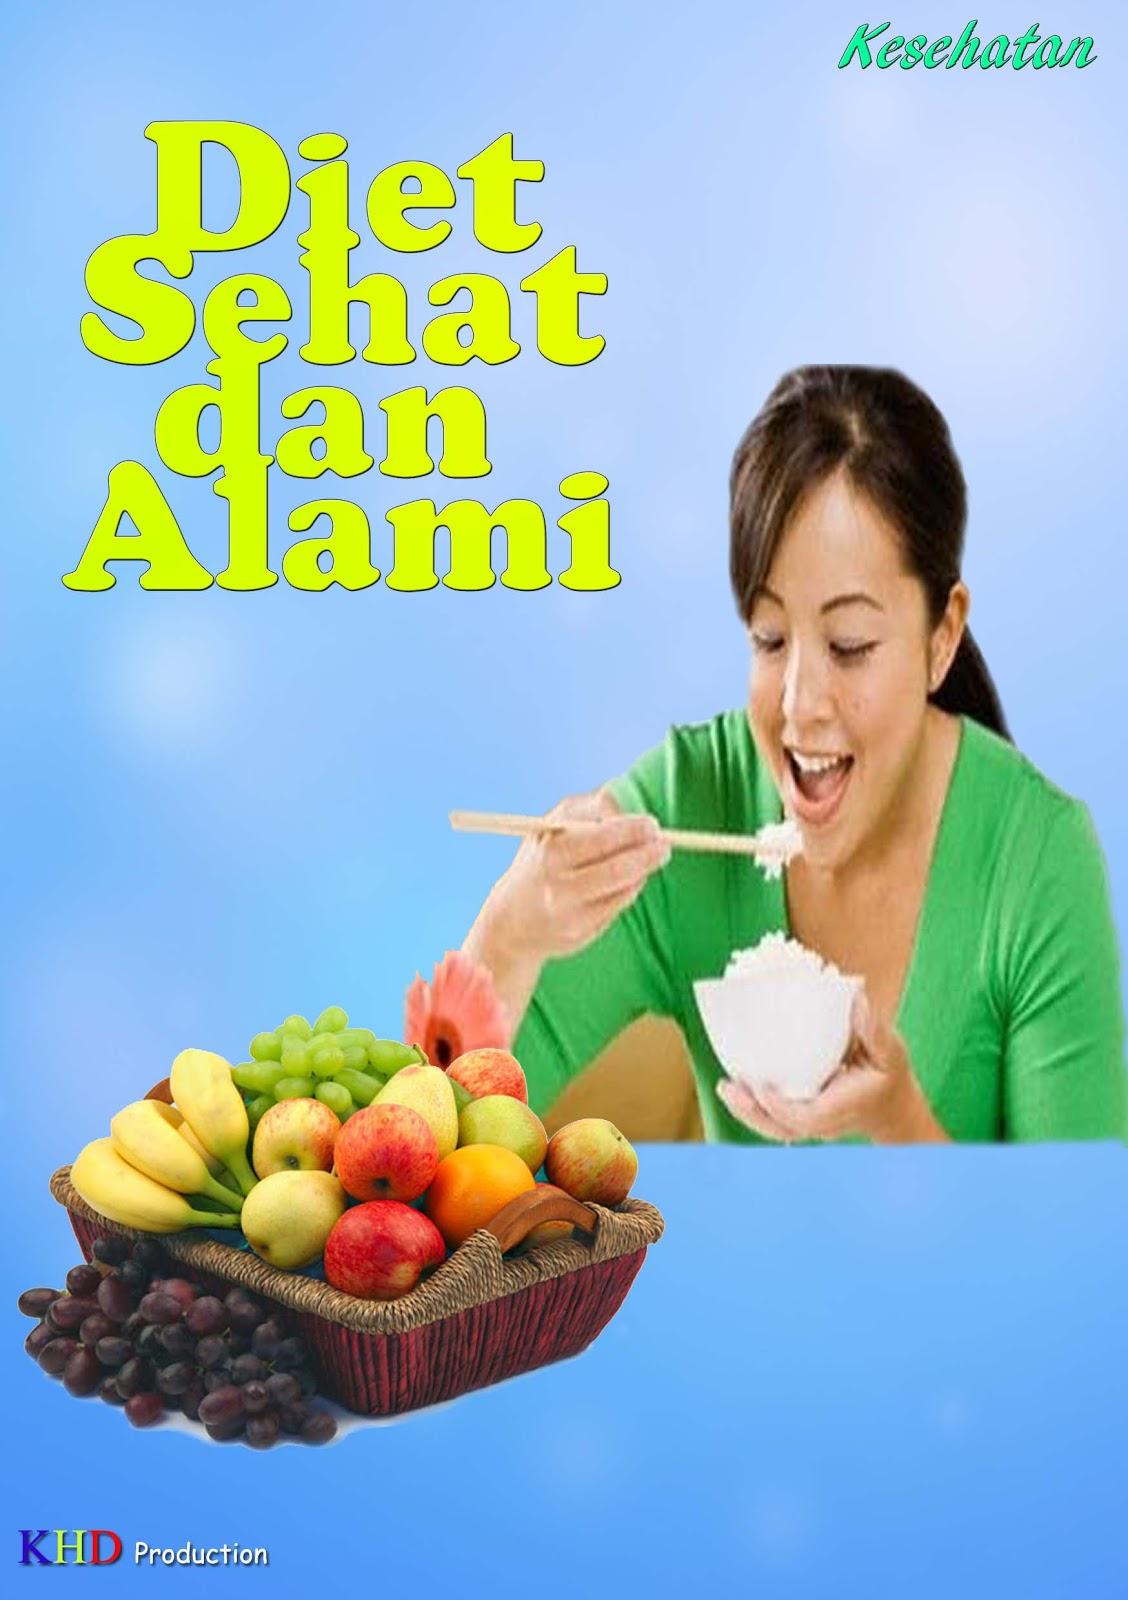 Kesehatan: Diet sehat alami